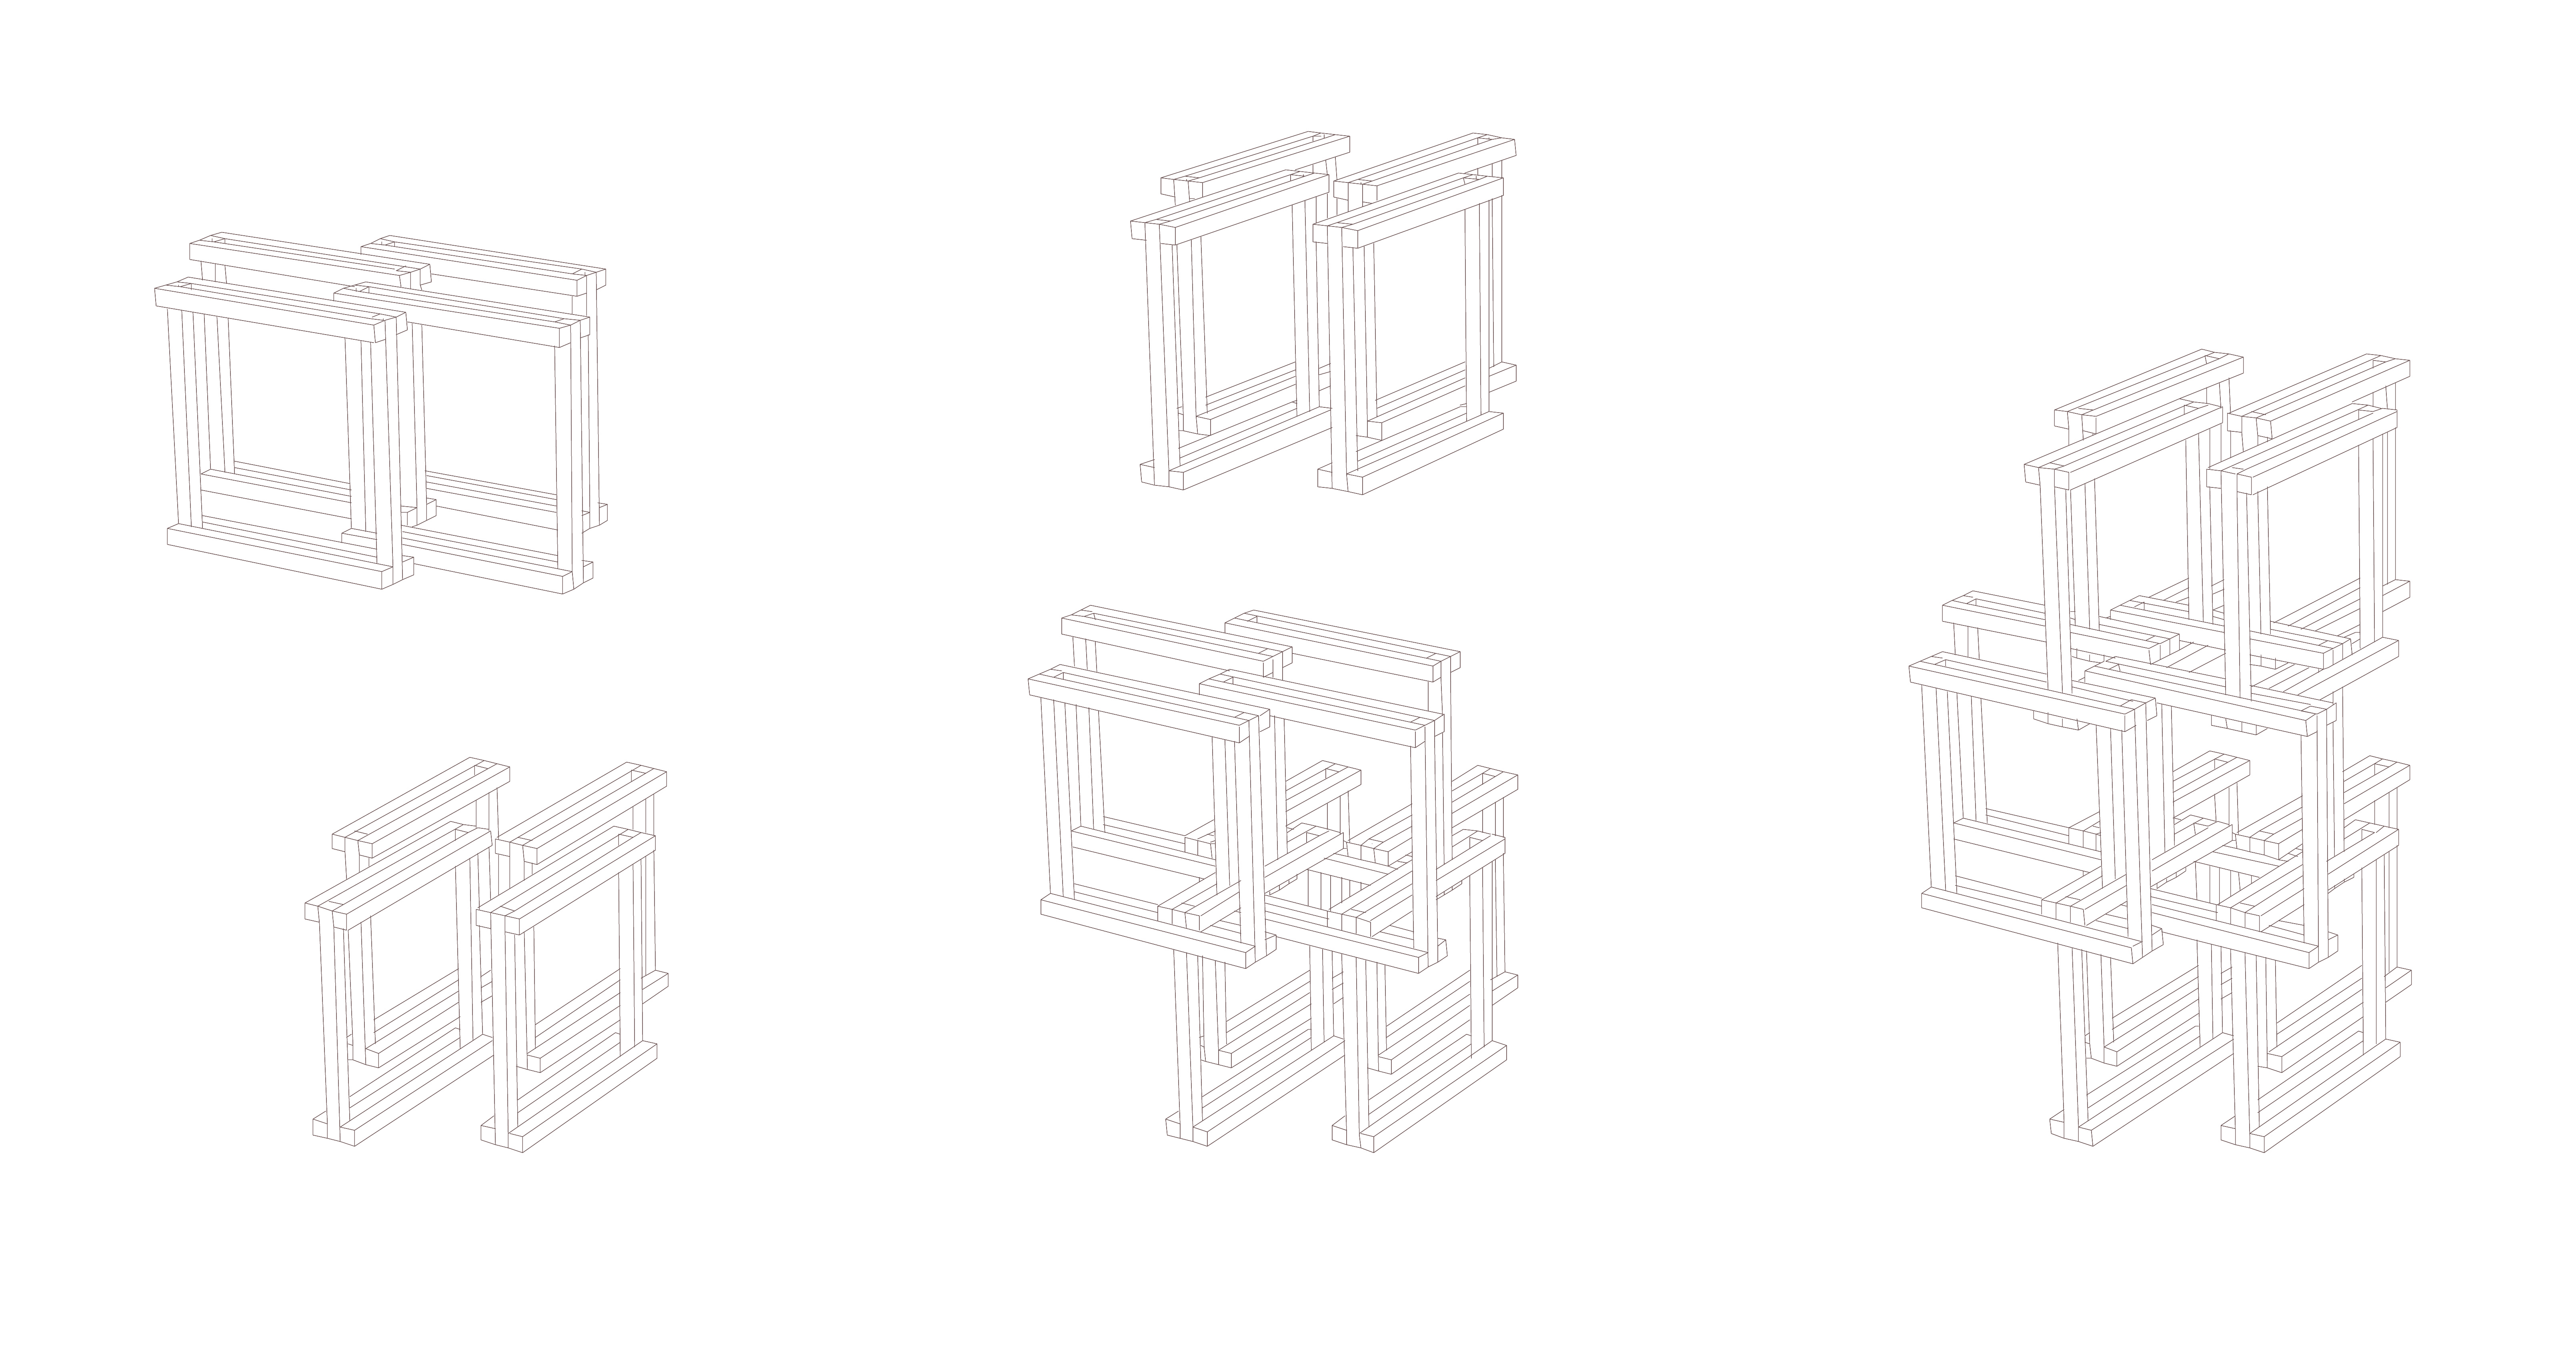 121205_152_GR06_Diagramms_001_PR